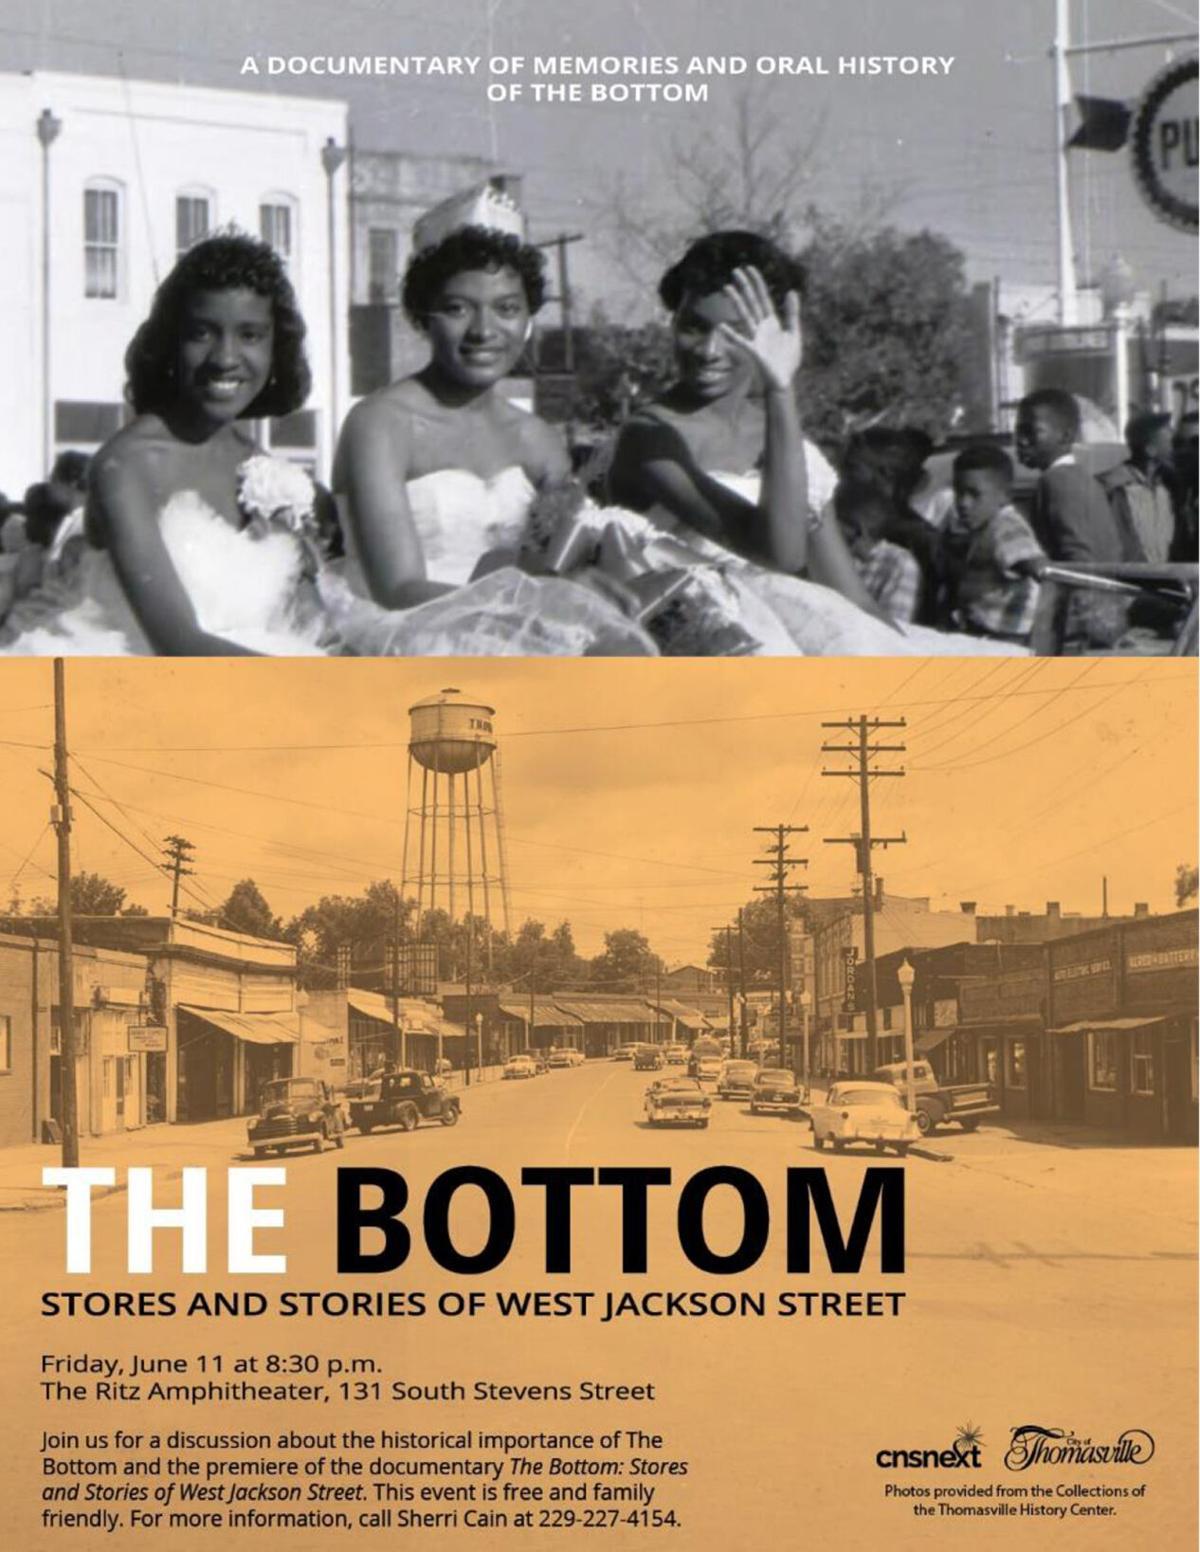 The Bottom documentary